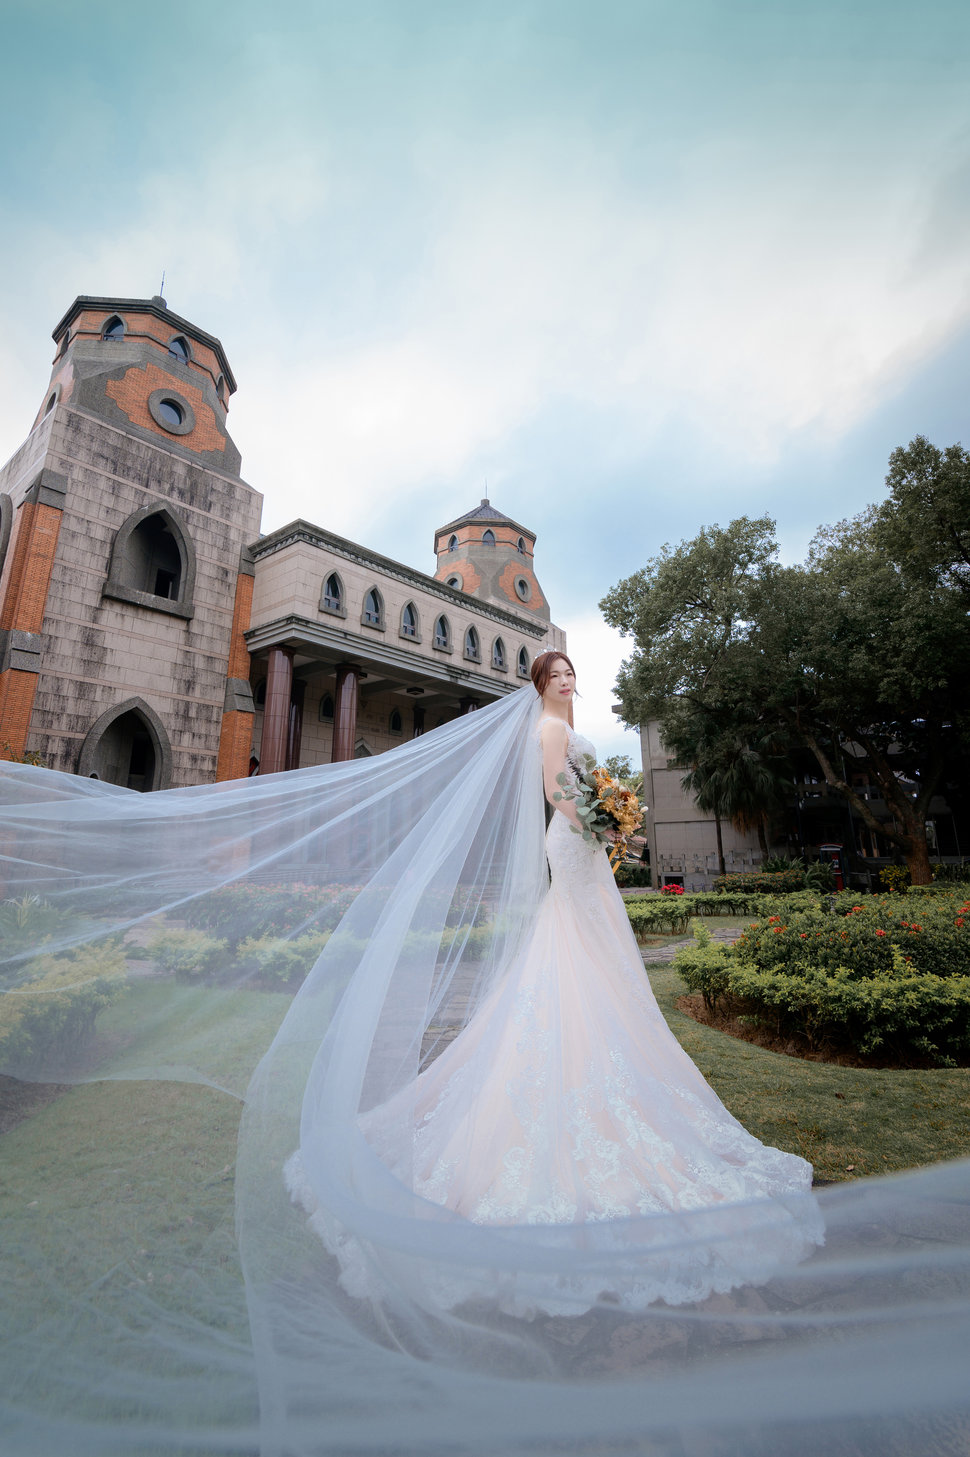 20200111-YEU_5531-1 - 花蓮婚紗 - Sposa Bella《結婚吧》